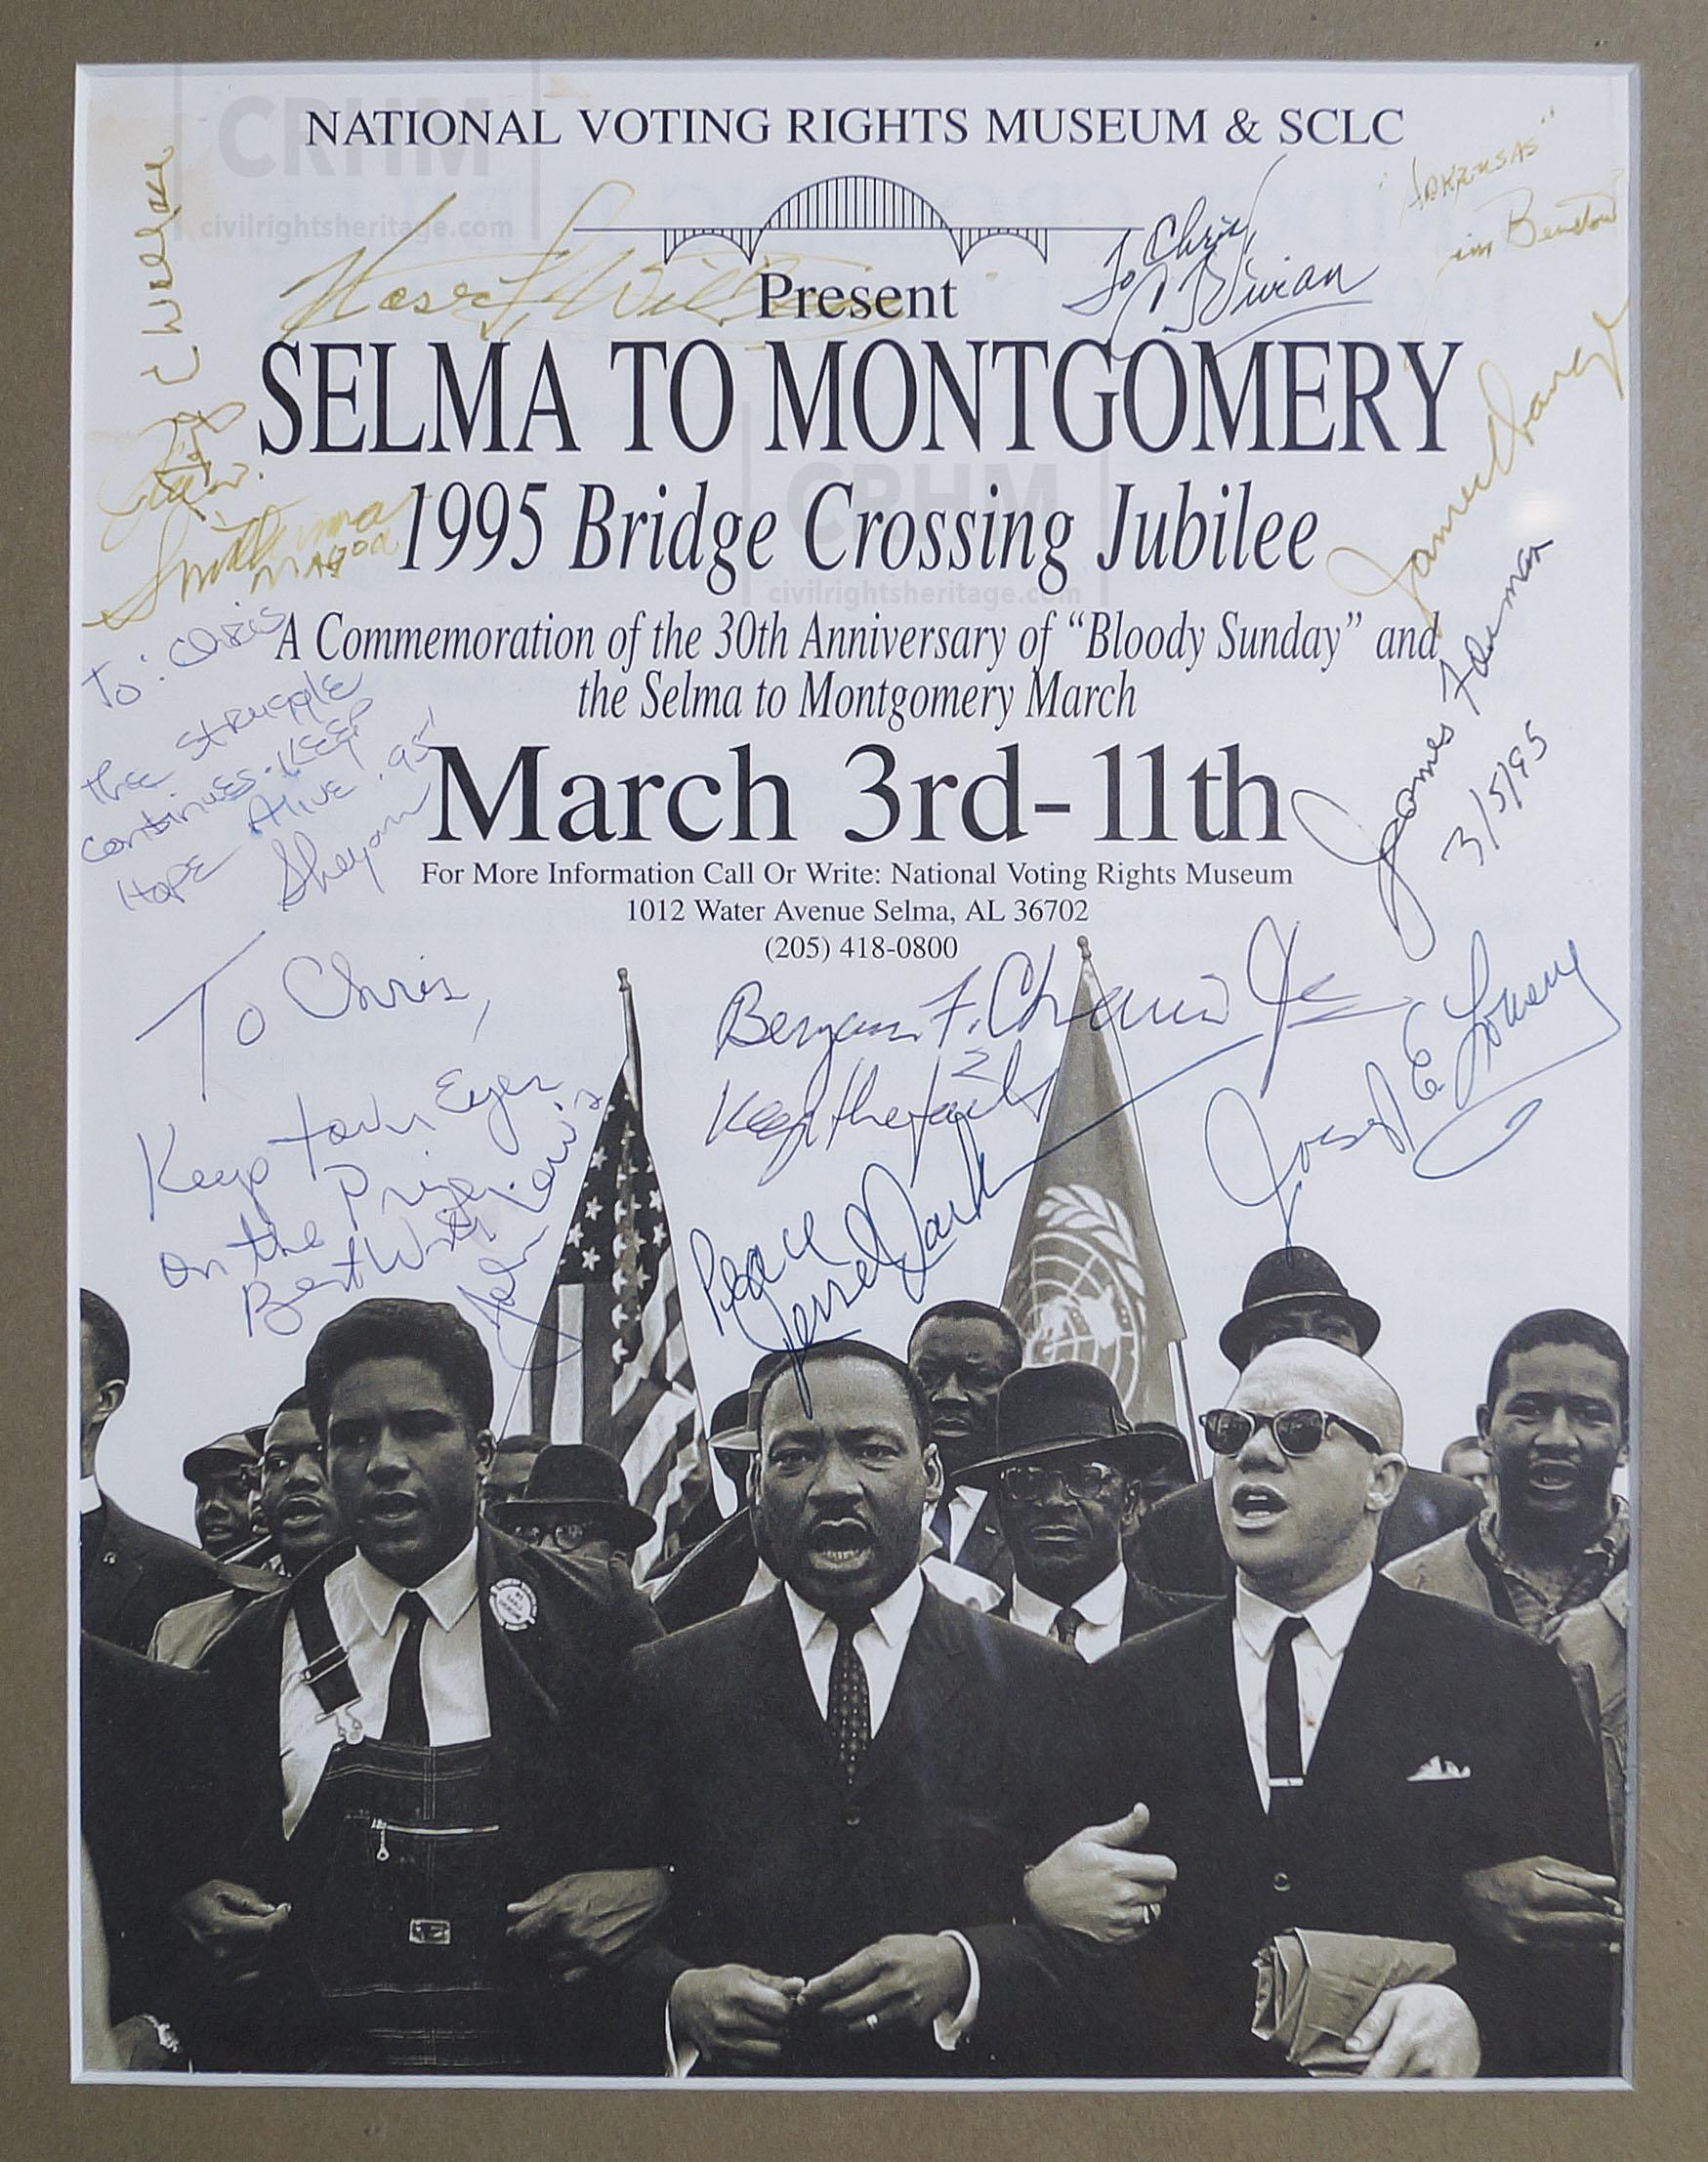 Selma-to-Montgomery-Forman-Lowery-Sheyann-Vivian-WM